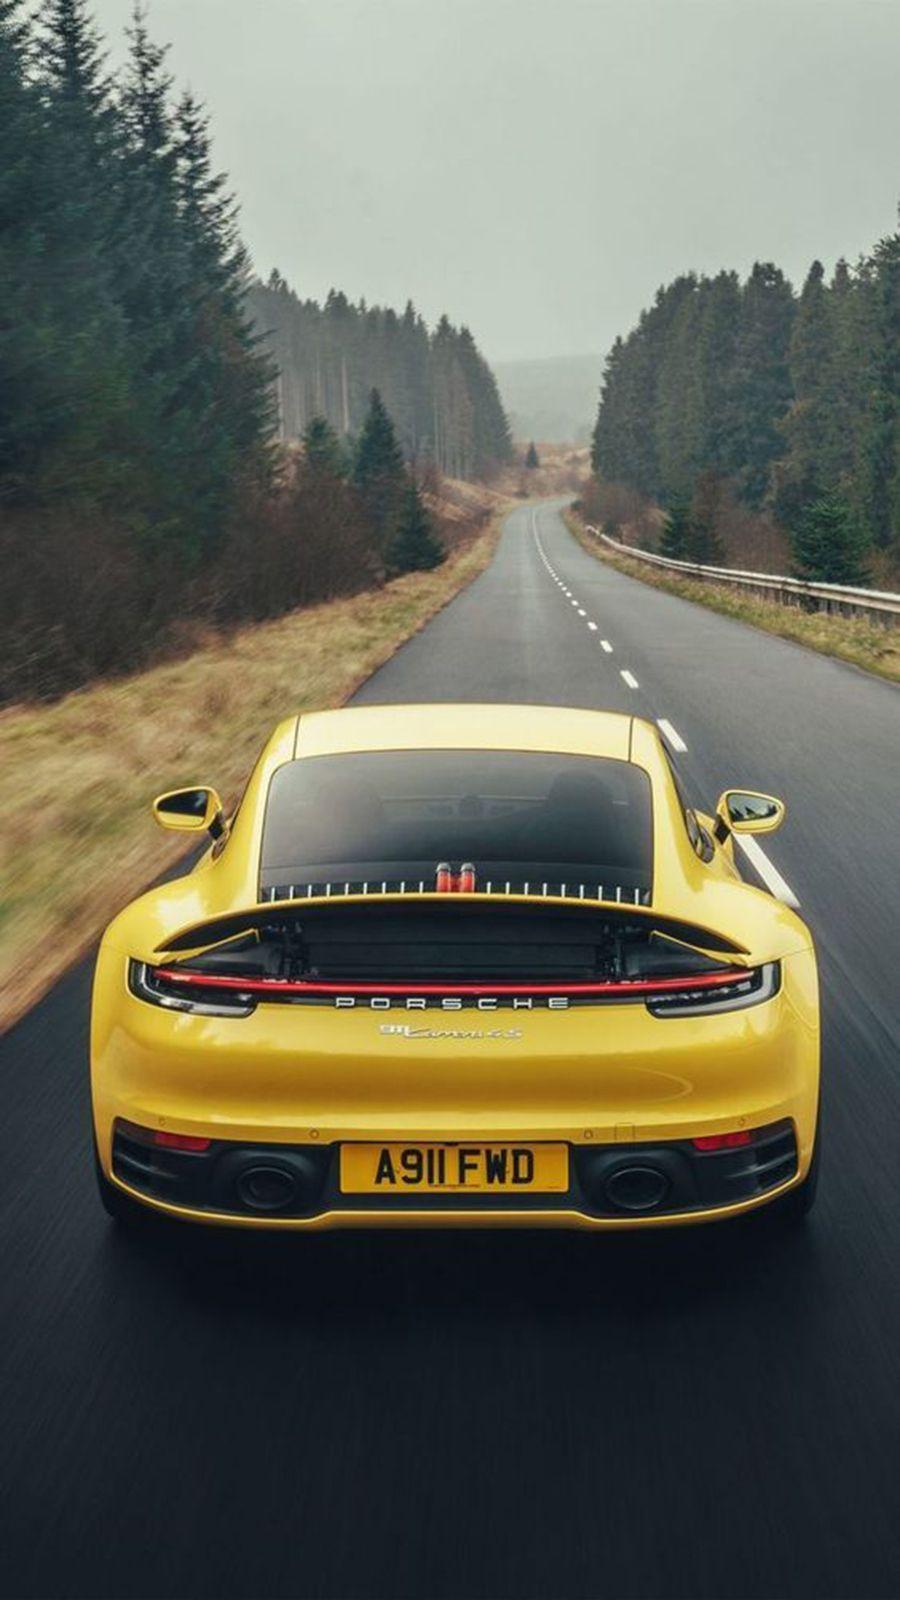 Back View Supercars Hd Wallpapers Free Download Bestwallpapers Porsche 911 Carrera 4s Luxury Car Photos Porsche